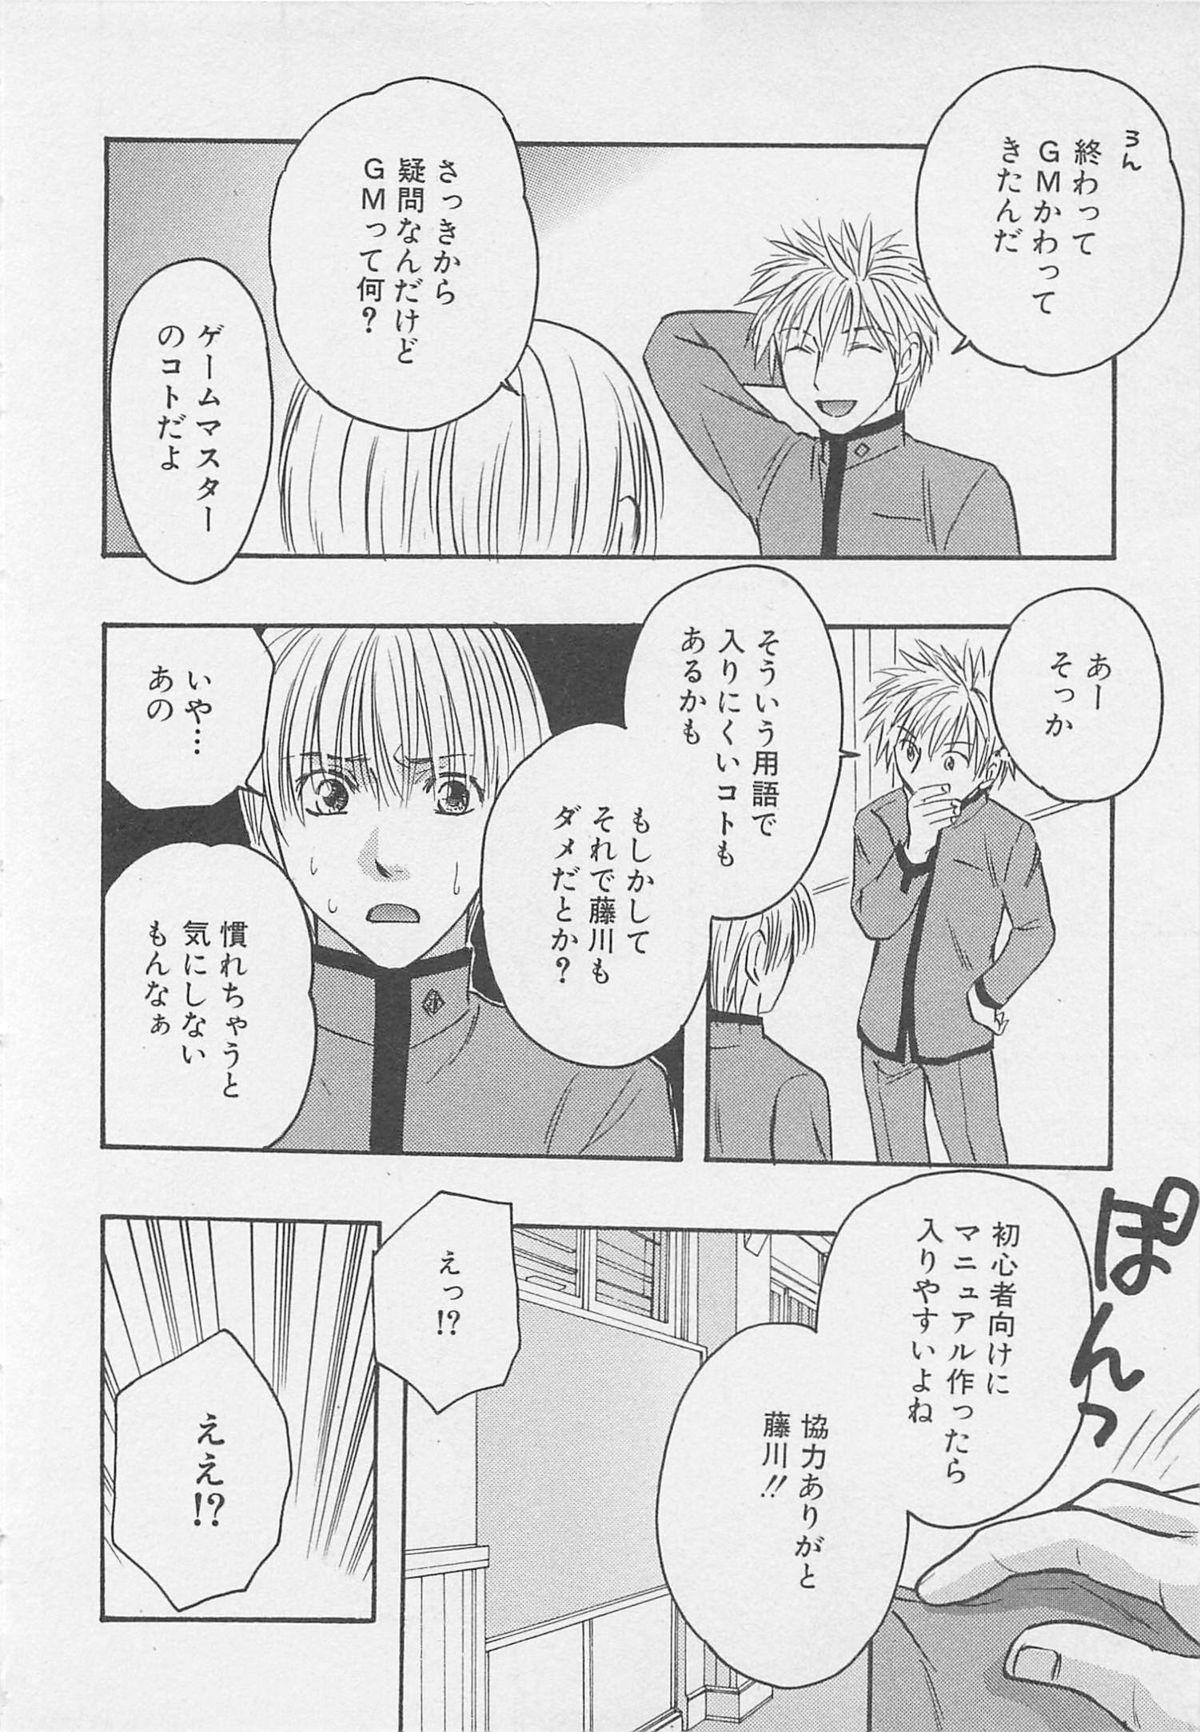 Shounentachi Vol. 2 124